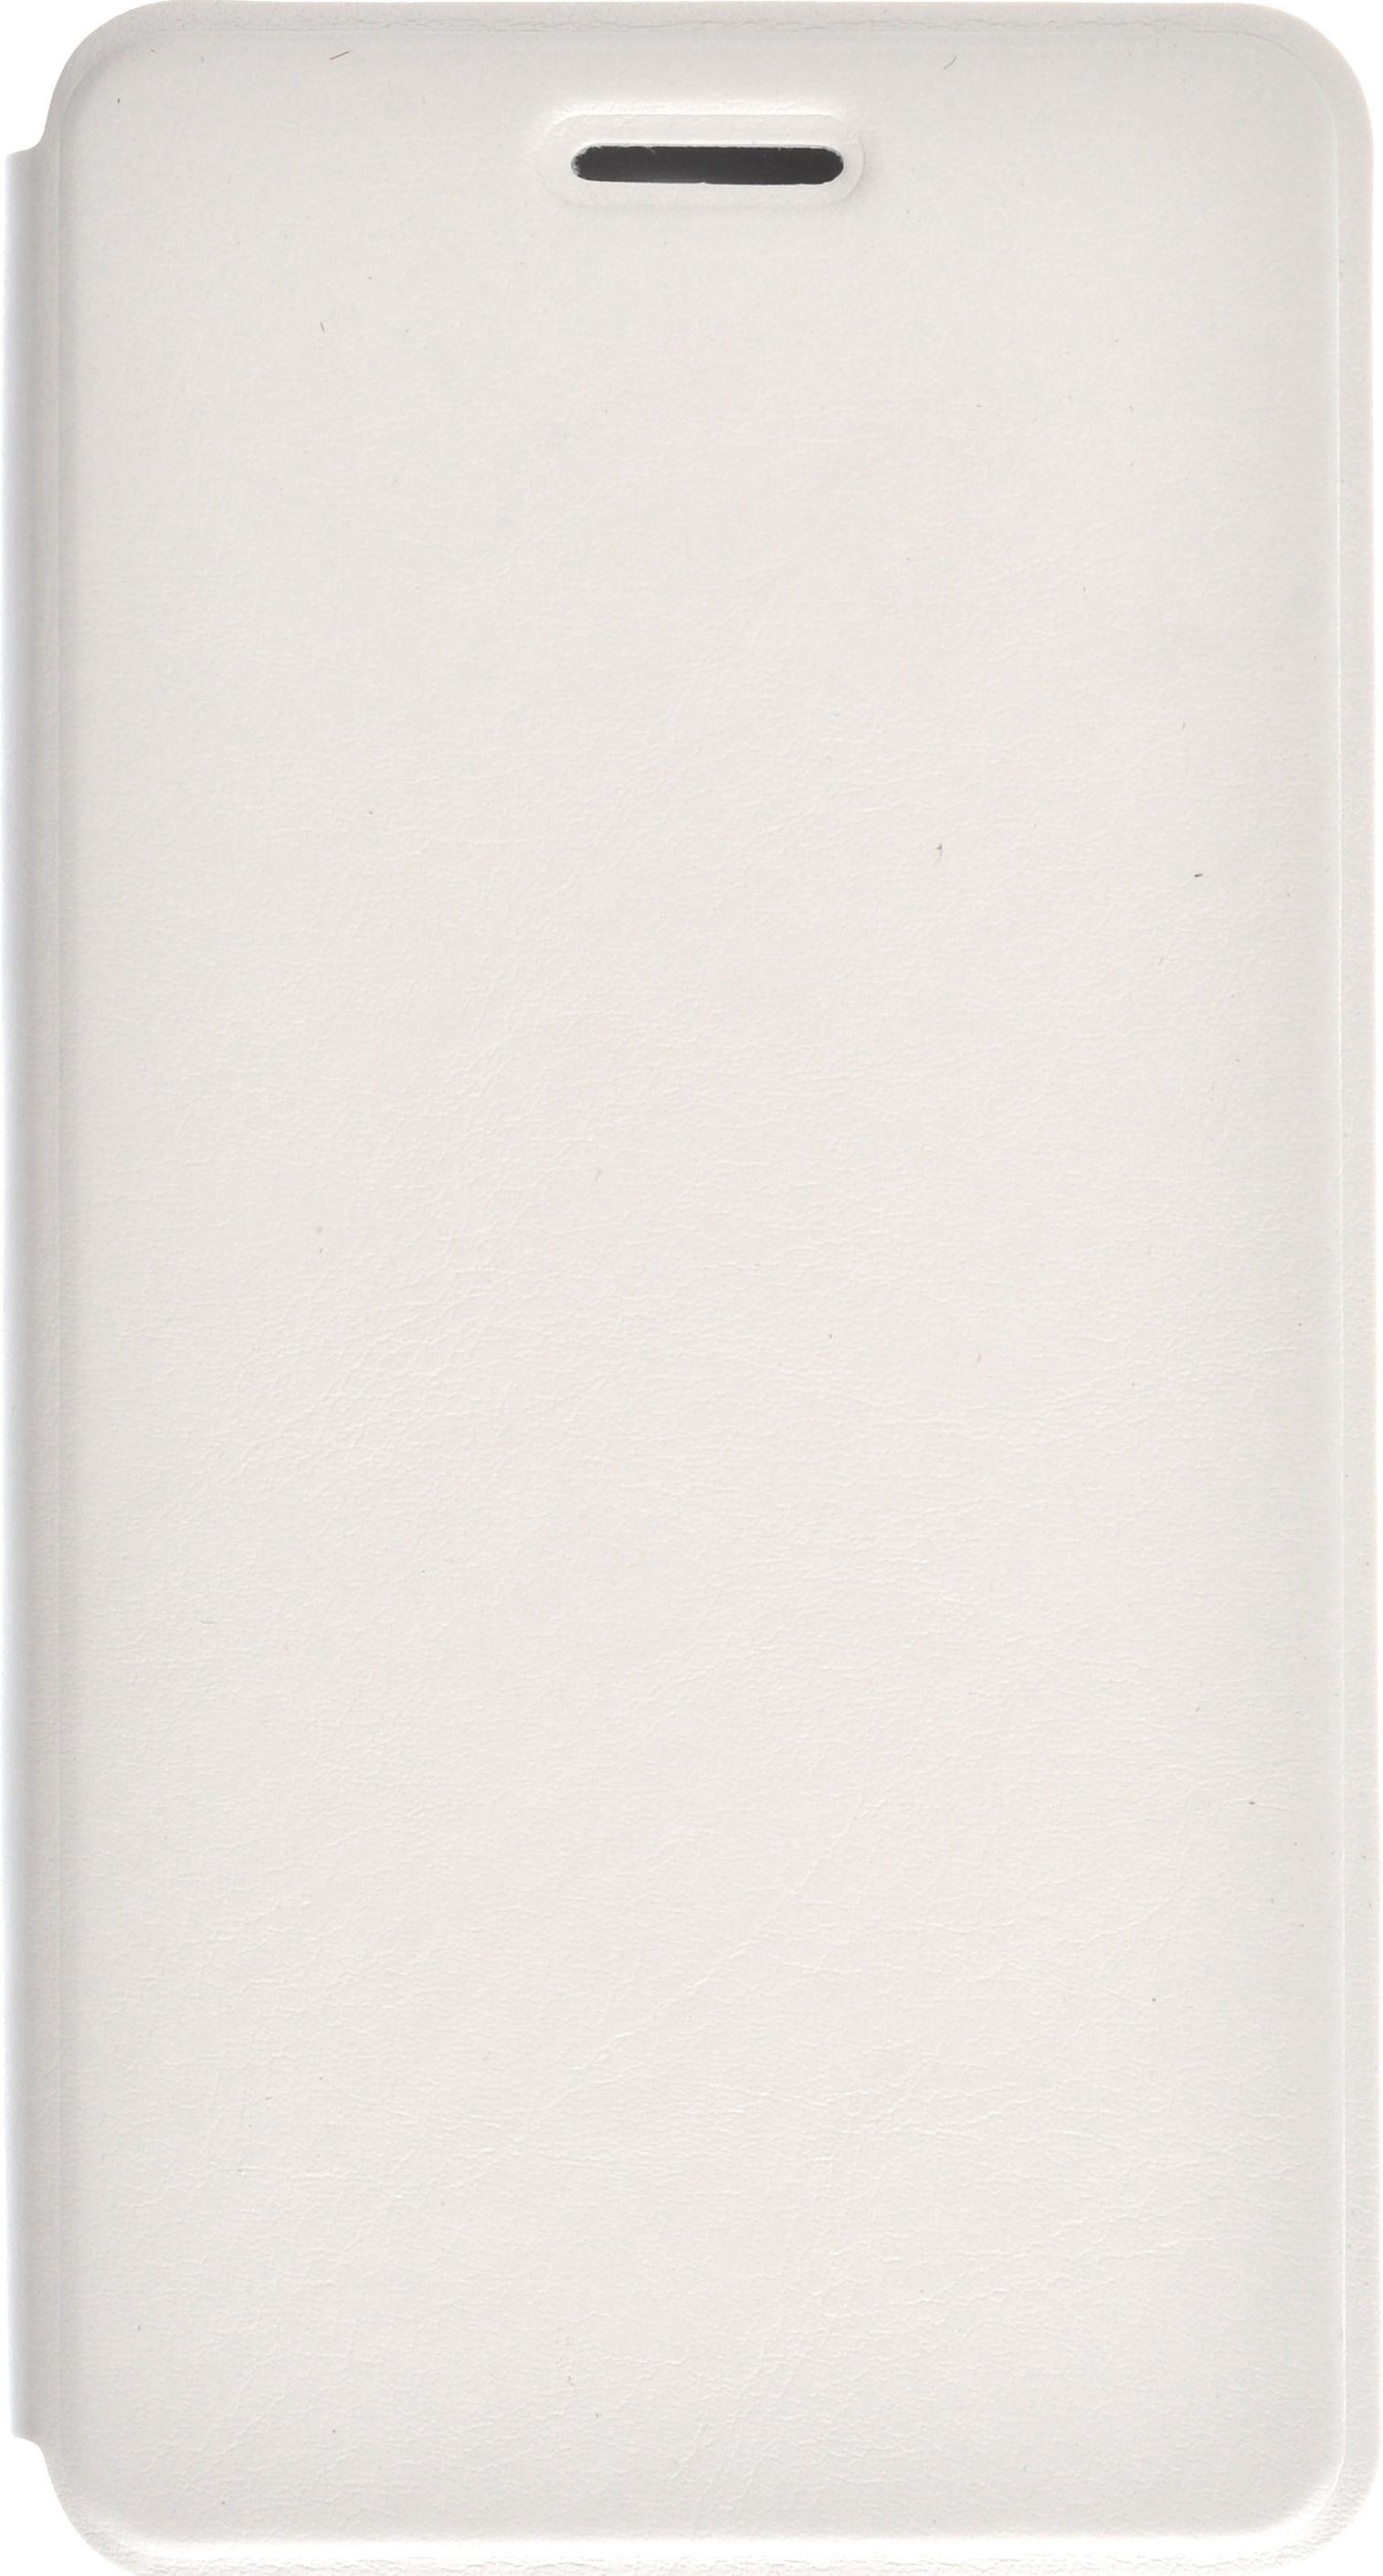 цена на Чехол для сотового телефона skinBOX Lux, 4630042527300, белый